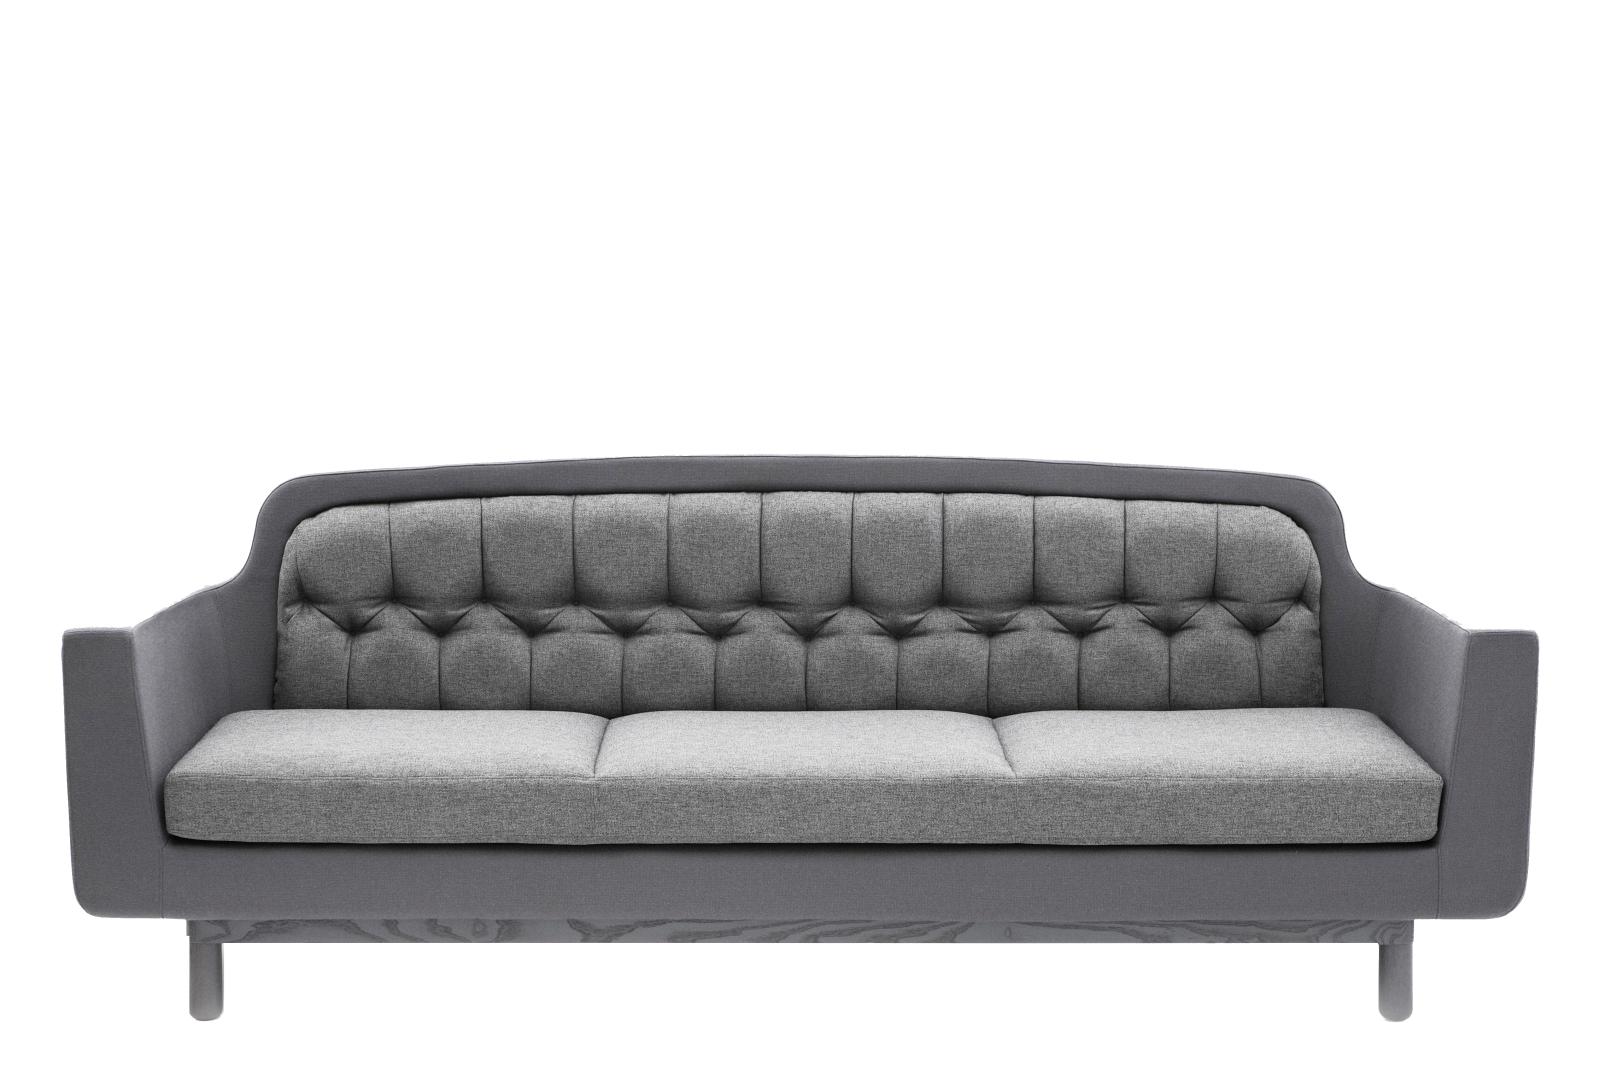 Onkel 3 Seater Sofa Light Grey